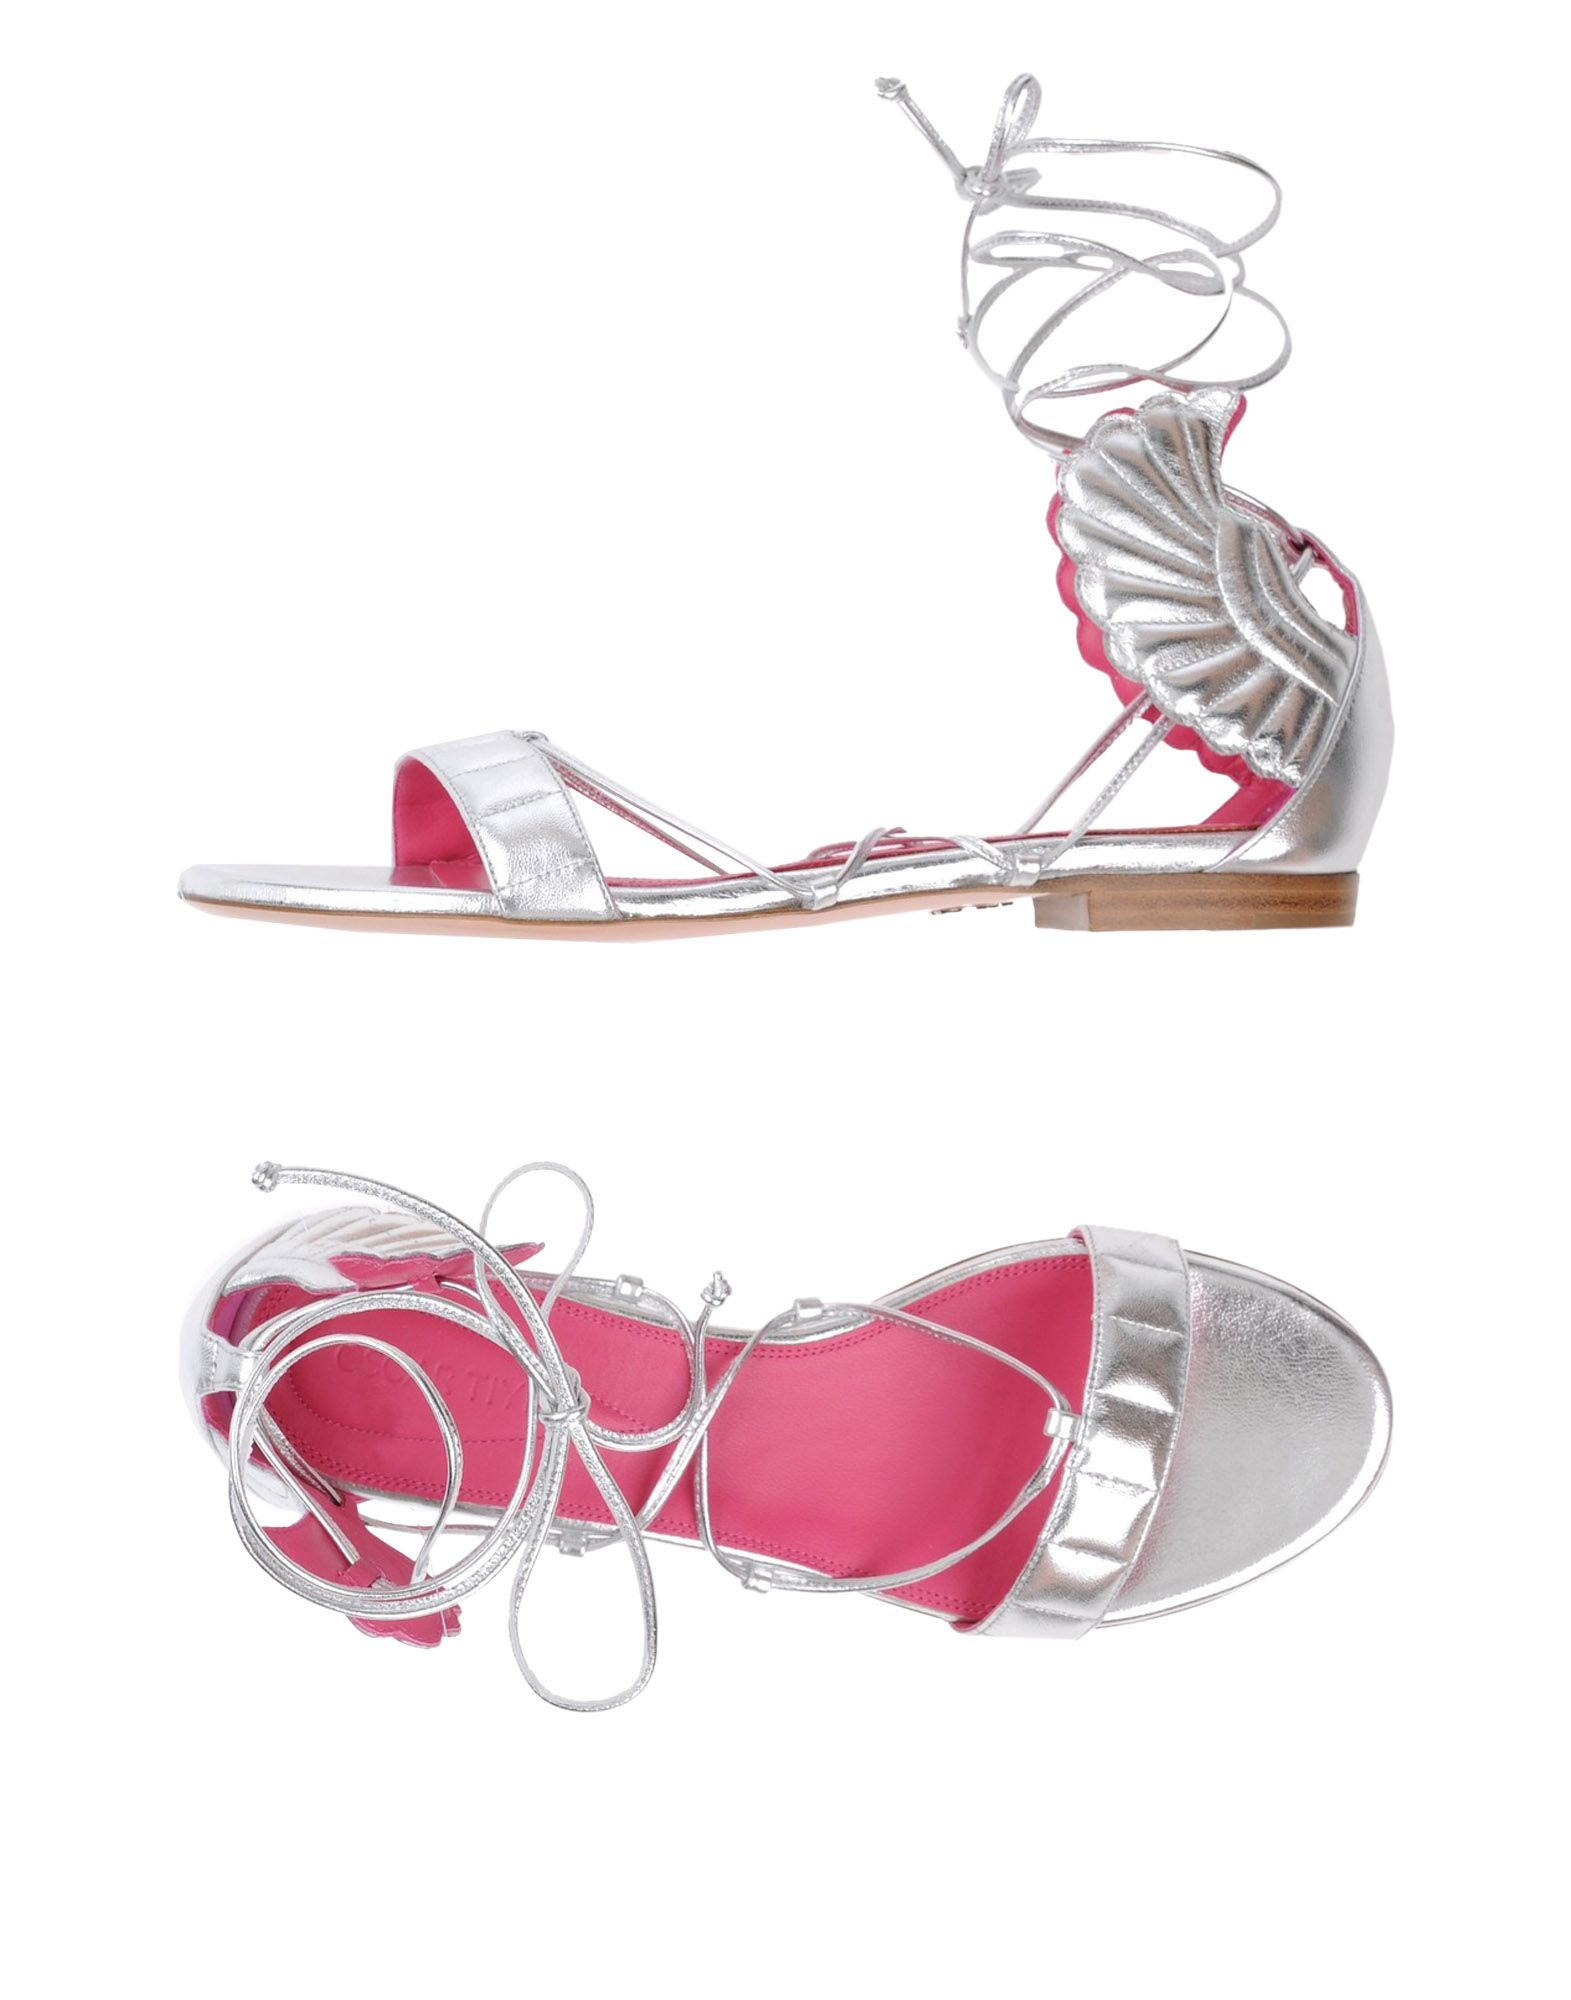 Oscar Tiye Sandalen Damen  11326786WQGut aussehende strapazierfähige Schuhe